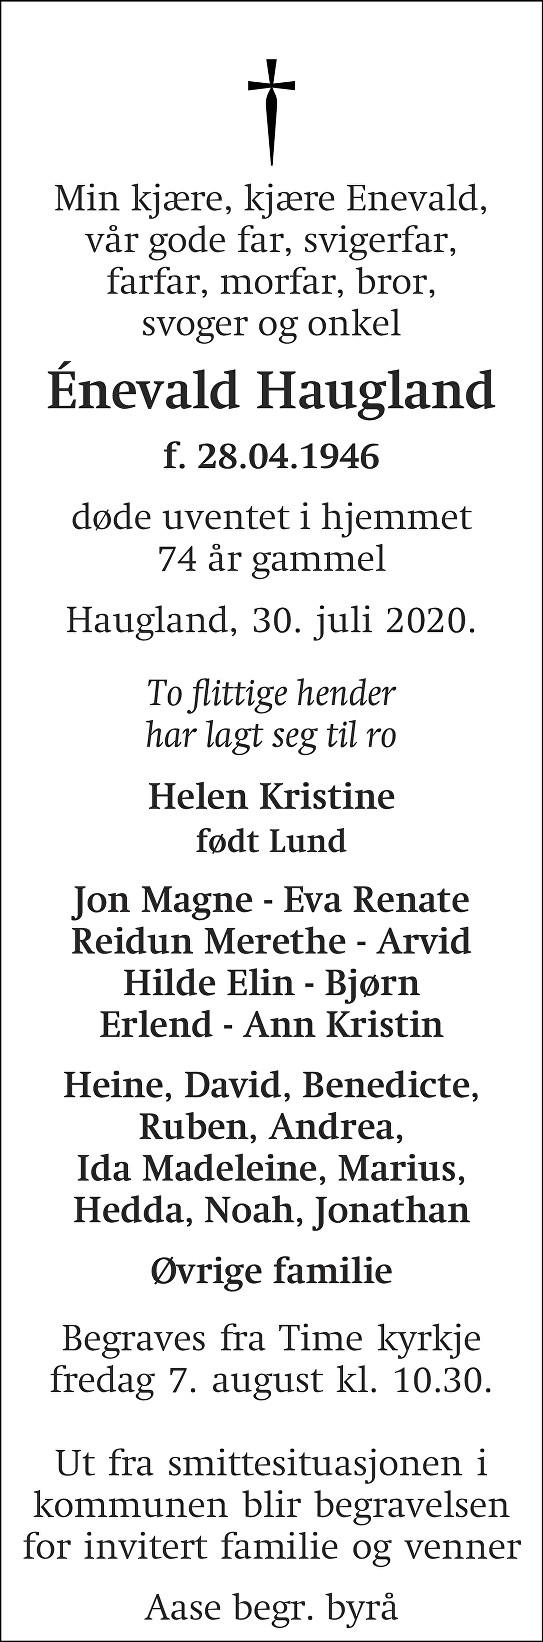 Énevald Haugland Dødsannonse